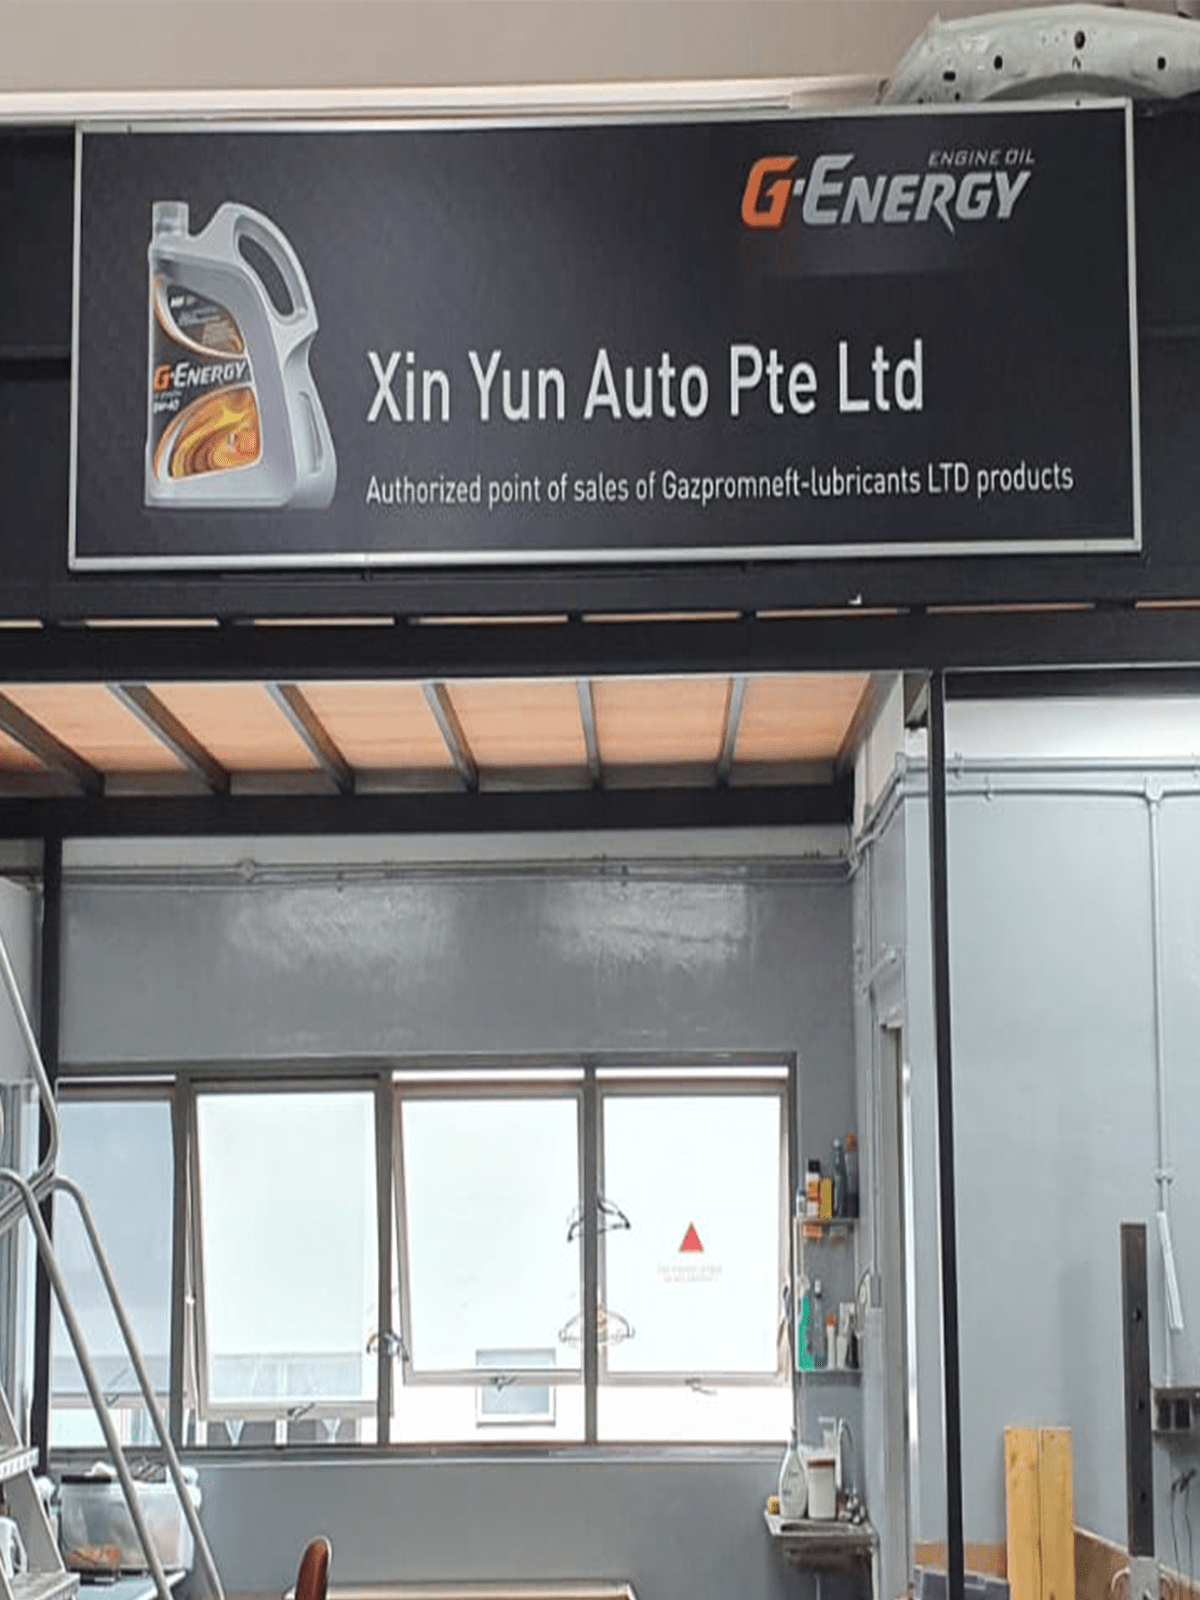 xin yun auto pte ltd